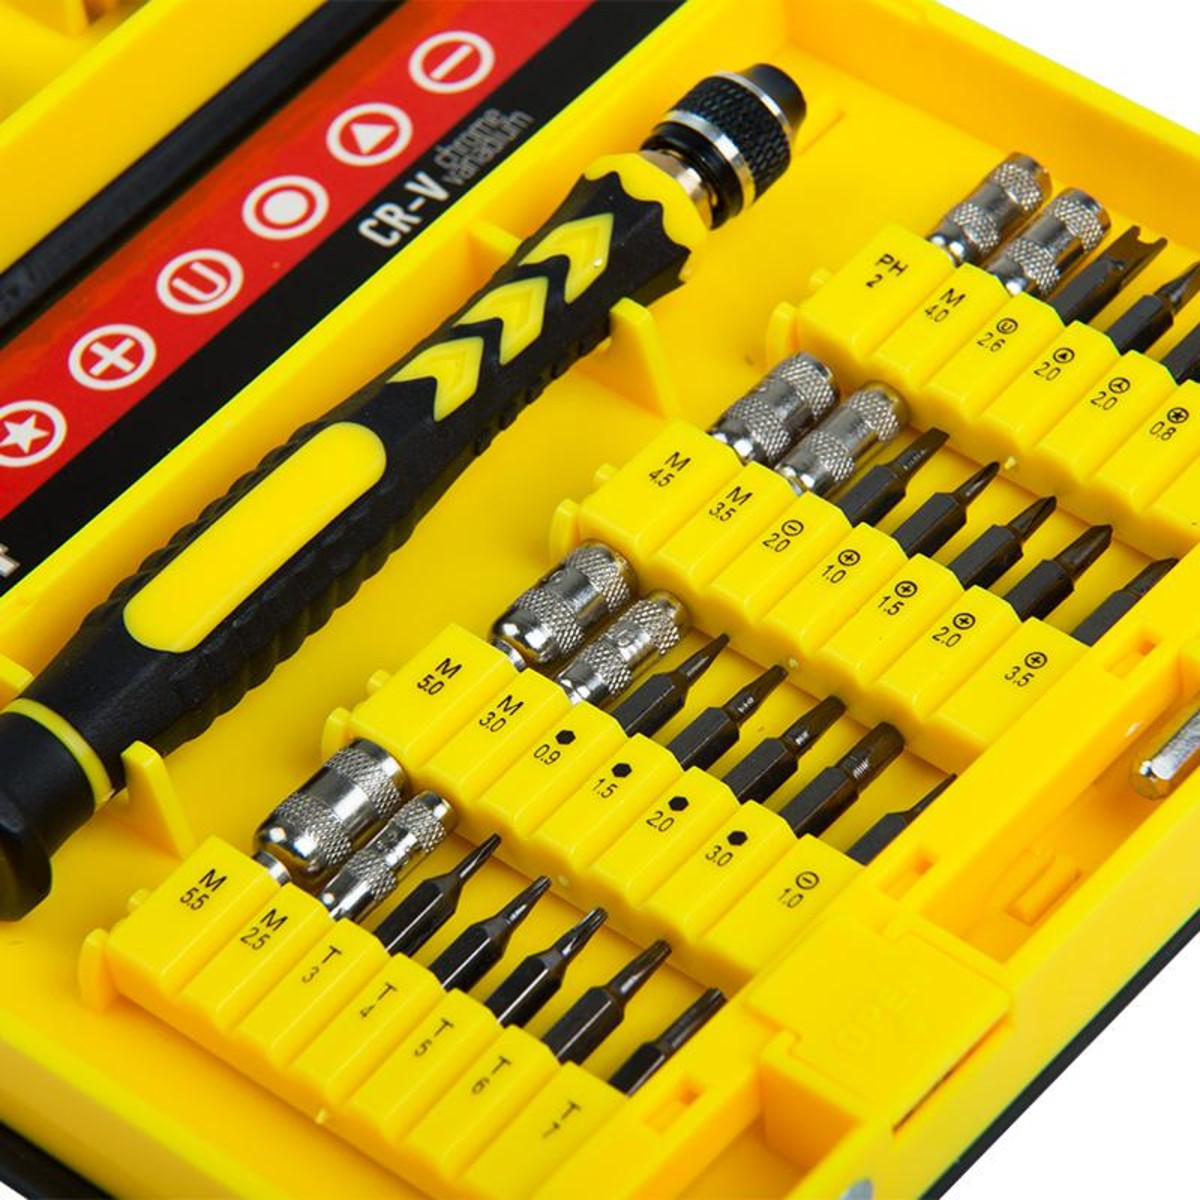 Набор инструментов REXANT Профи 12-4761